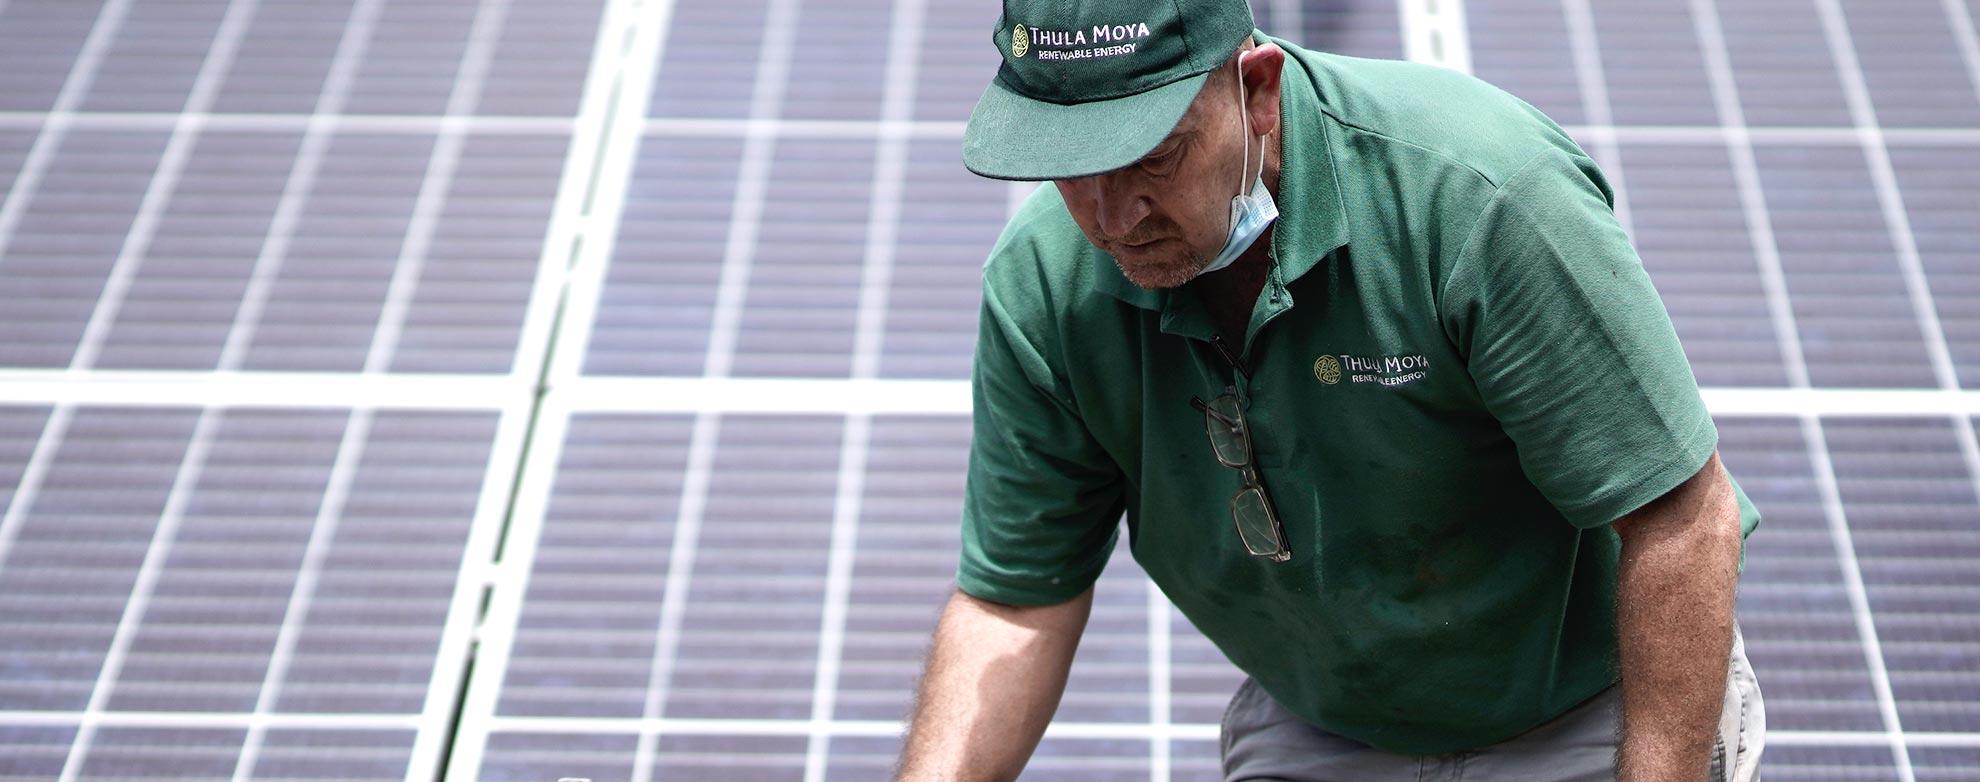 thula-moya-energy-solutions-wind-sun-water-finance-guy